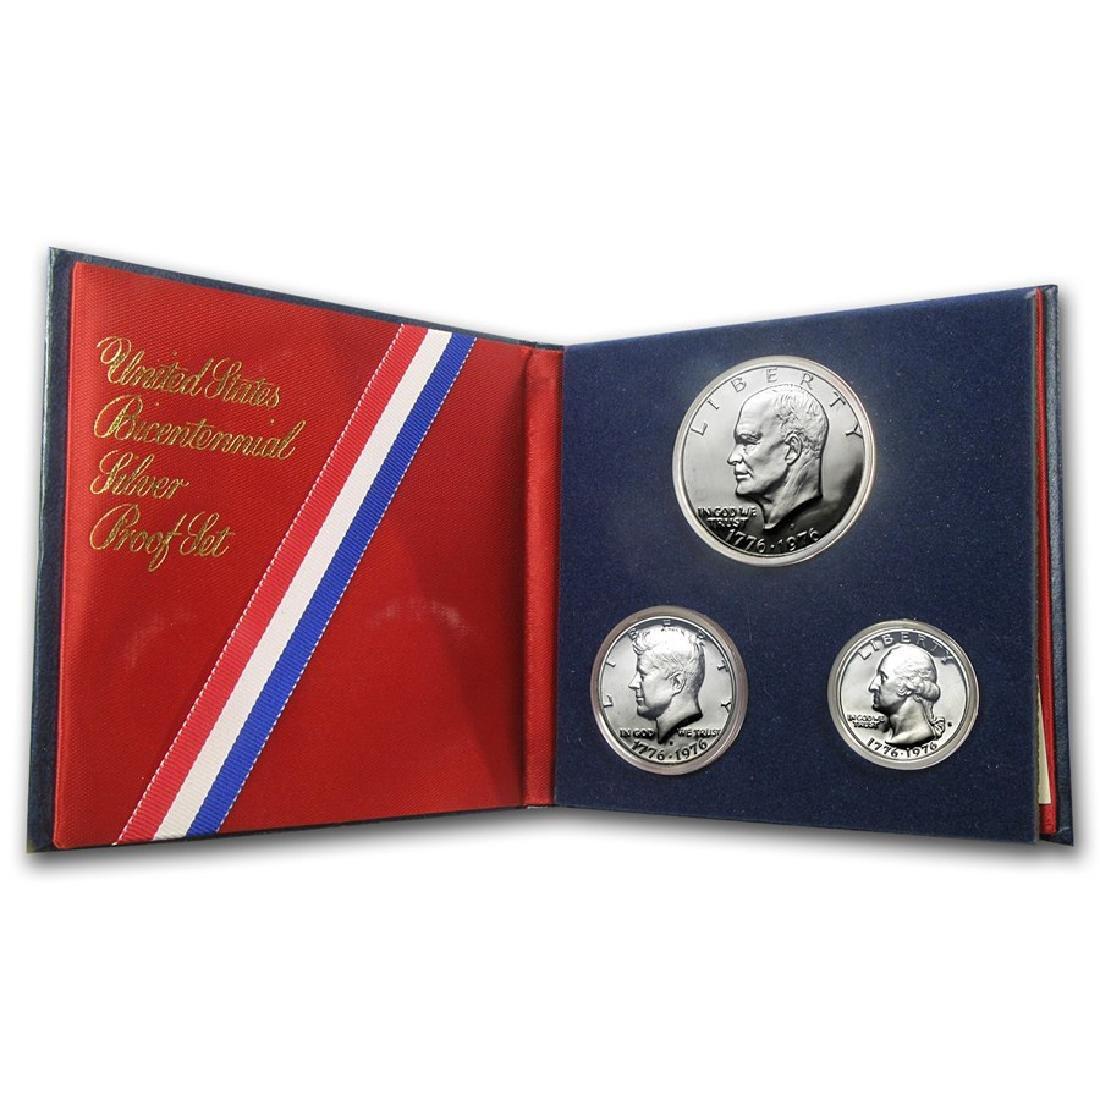 Lot of 2: 1776-1976 U.S. Bicentennial Silver Sets Proof - 3